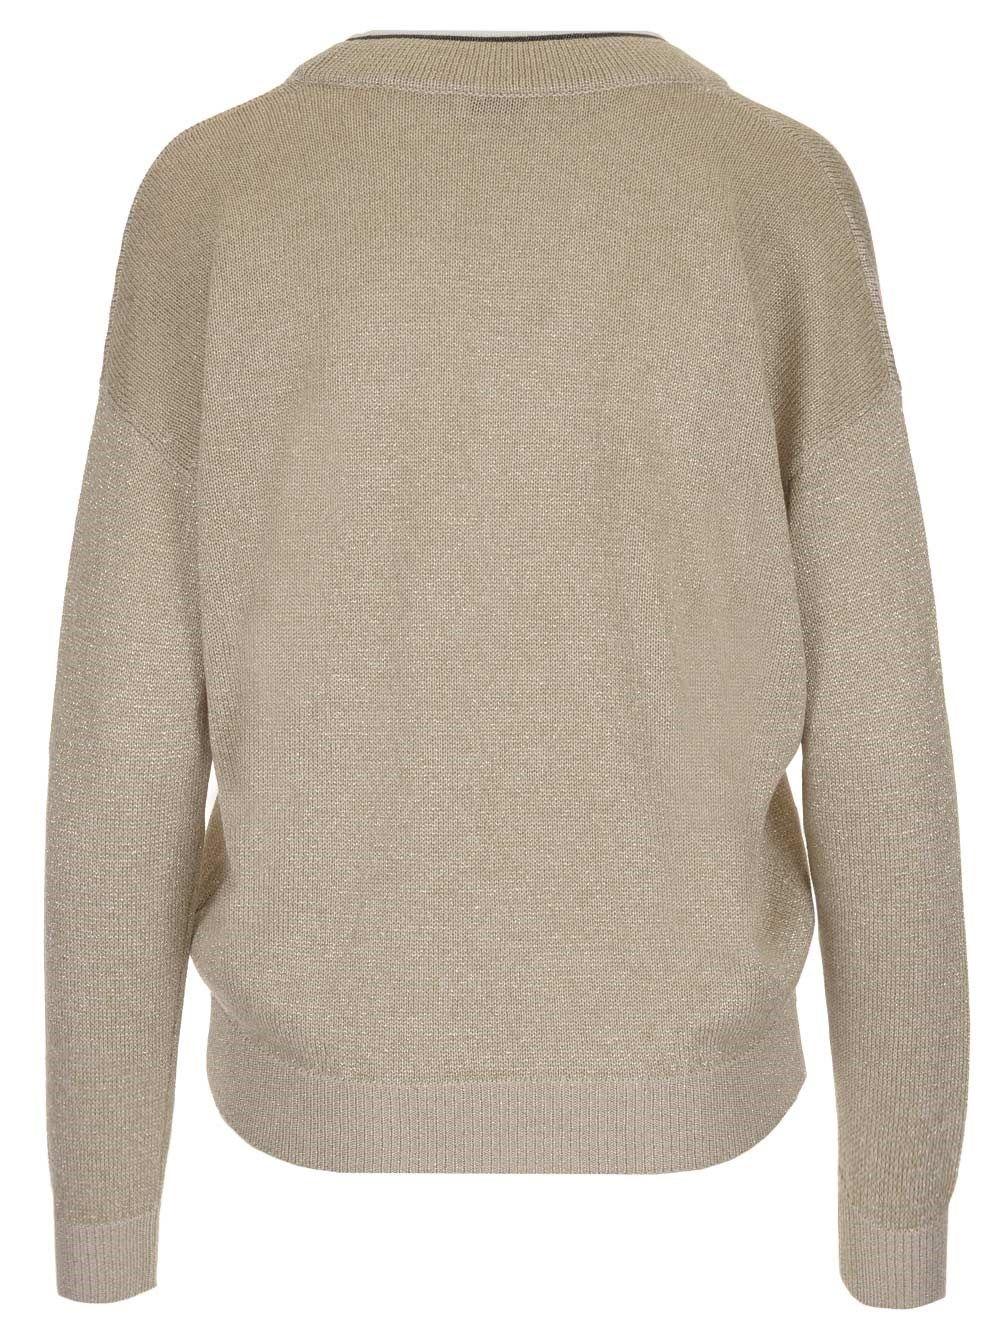 BRUNELLO CUCINELLI Sweaters BRUNELLO CUCINELLI WOMEN'S BEIGE OTHER MATERIALS SWEATER